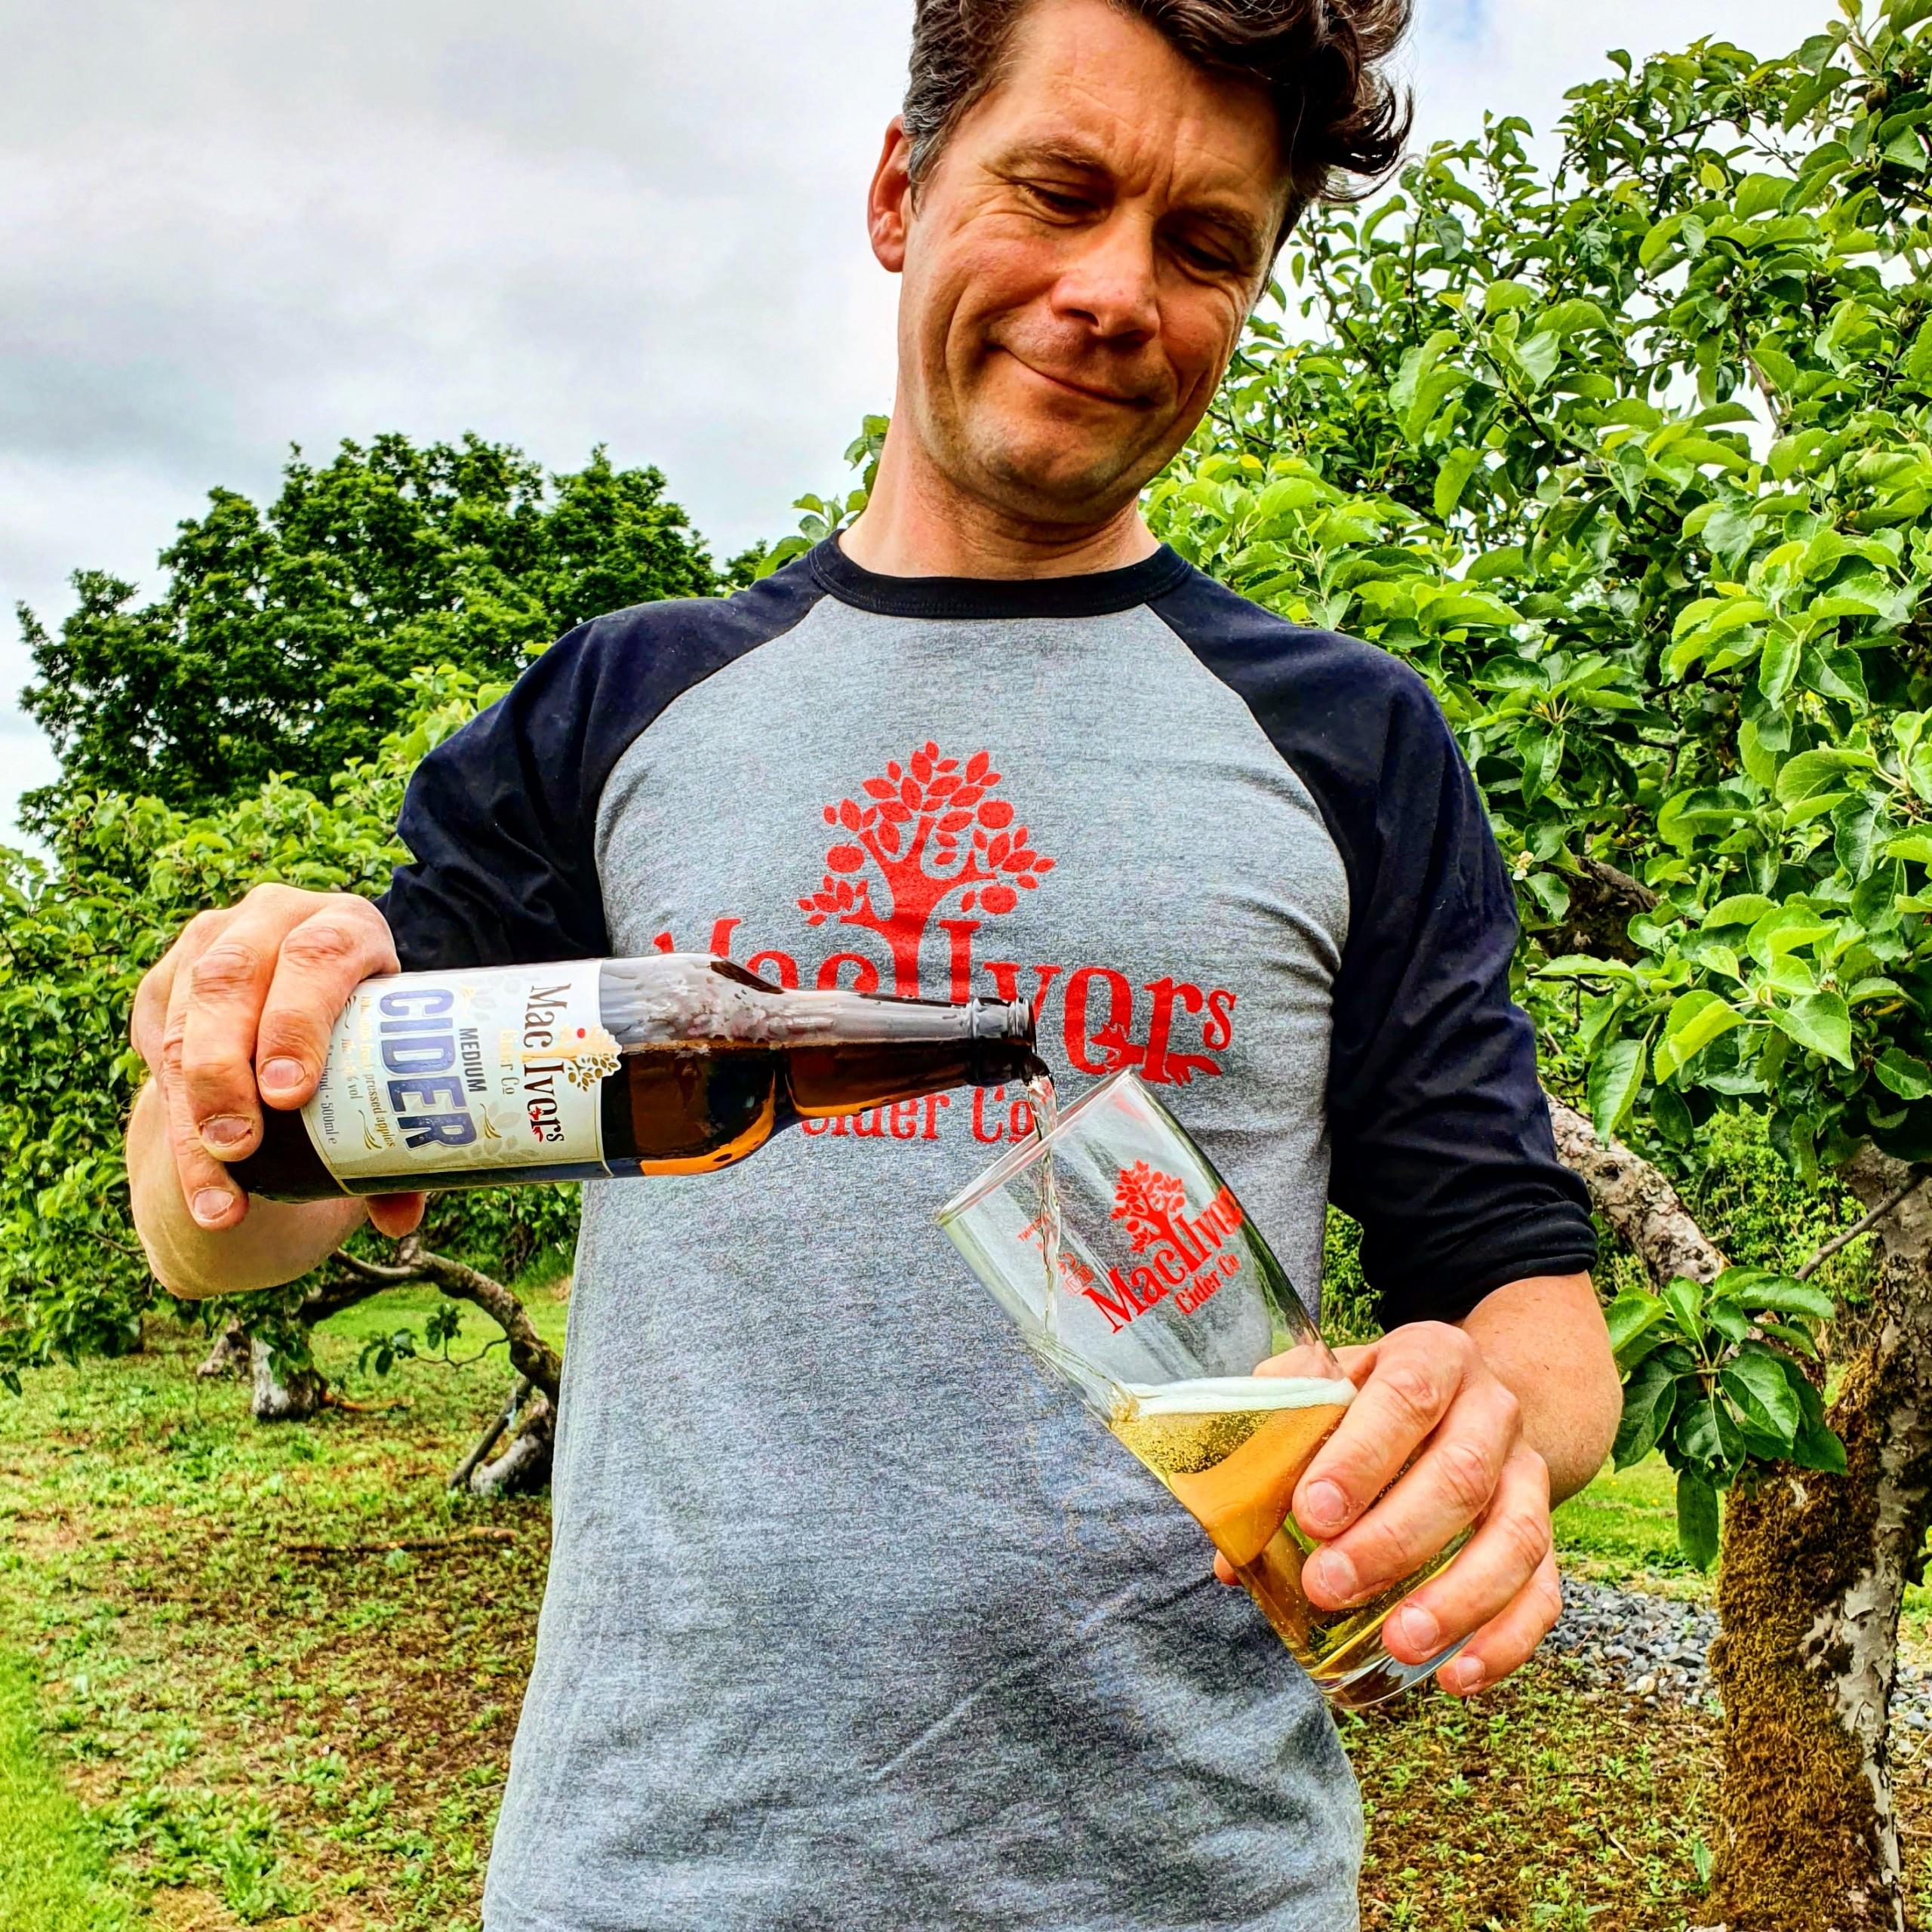 Mac Ivors Irish Cider